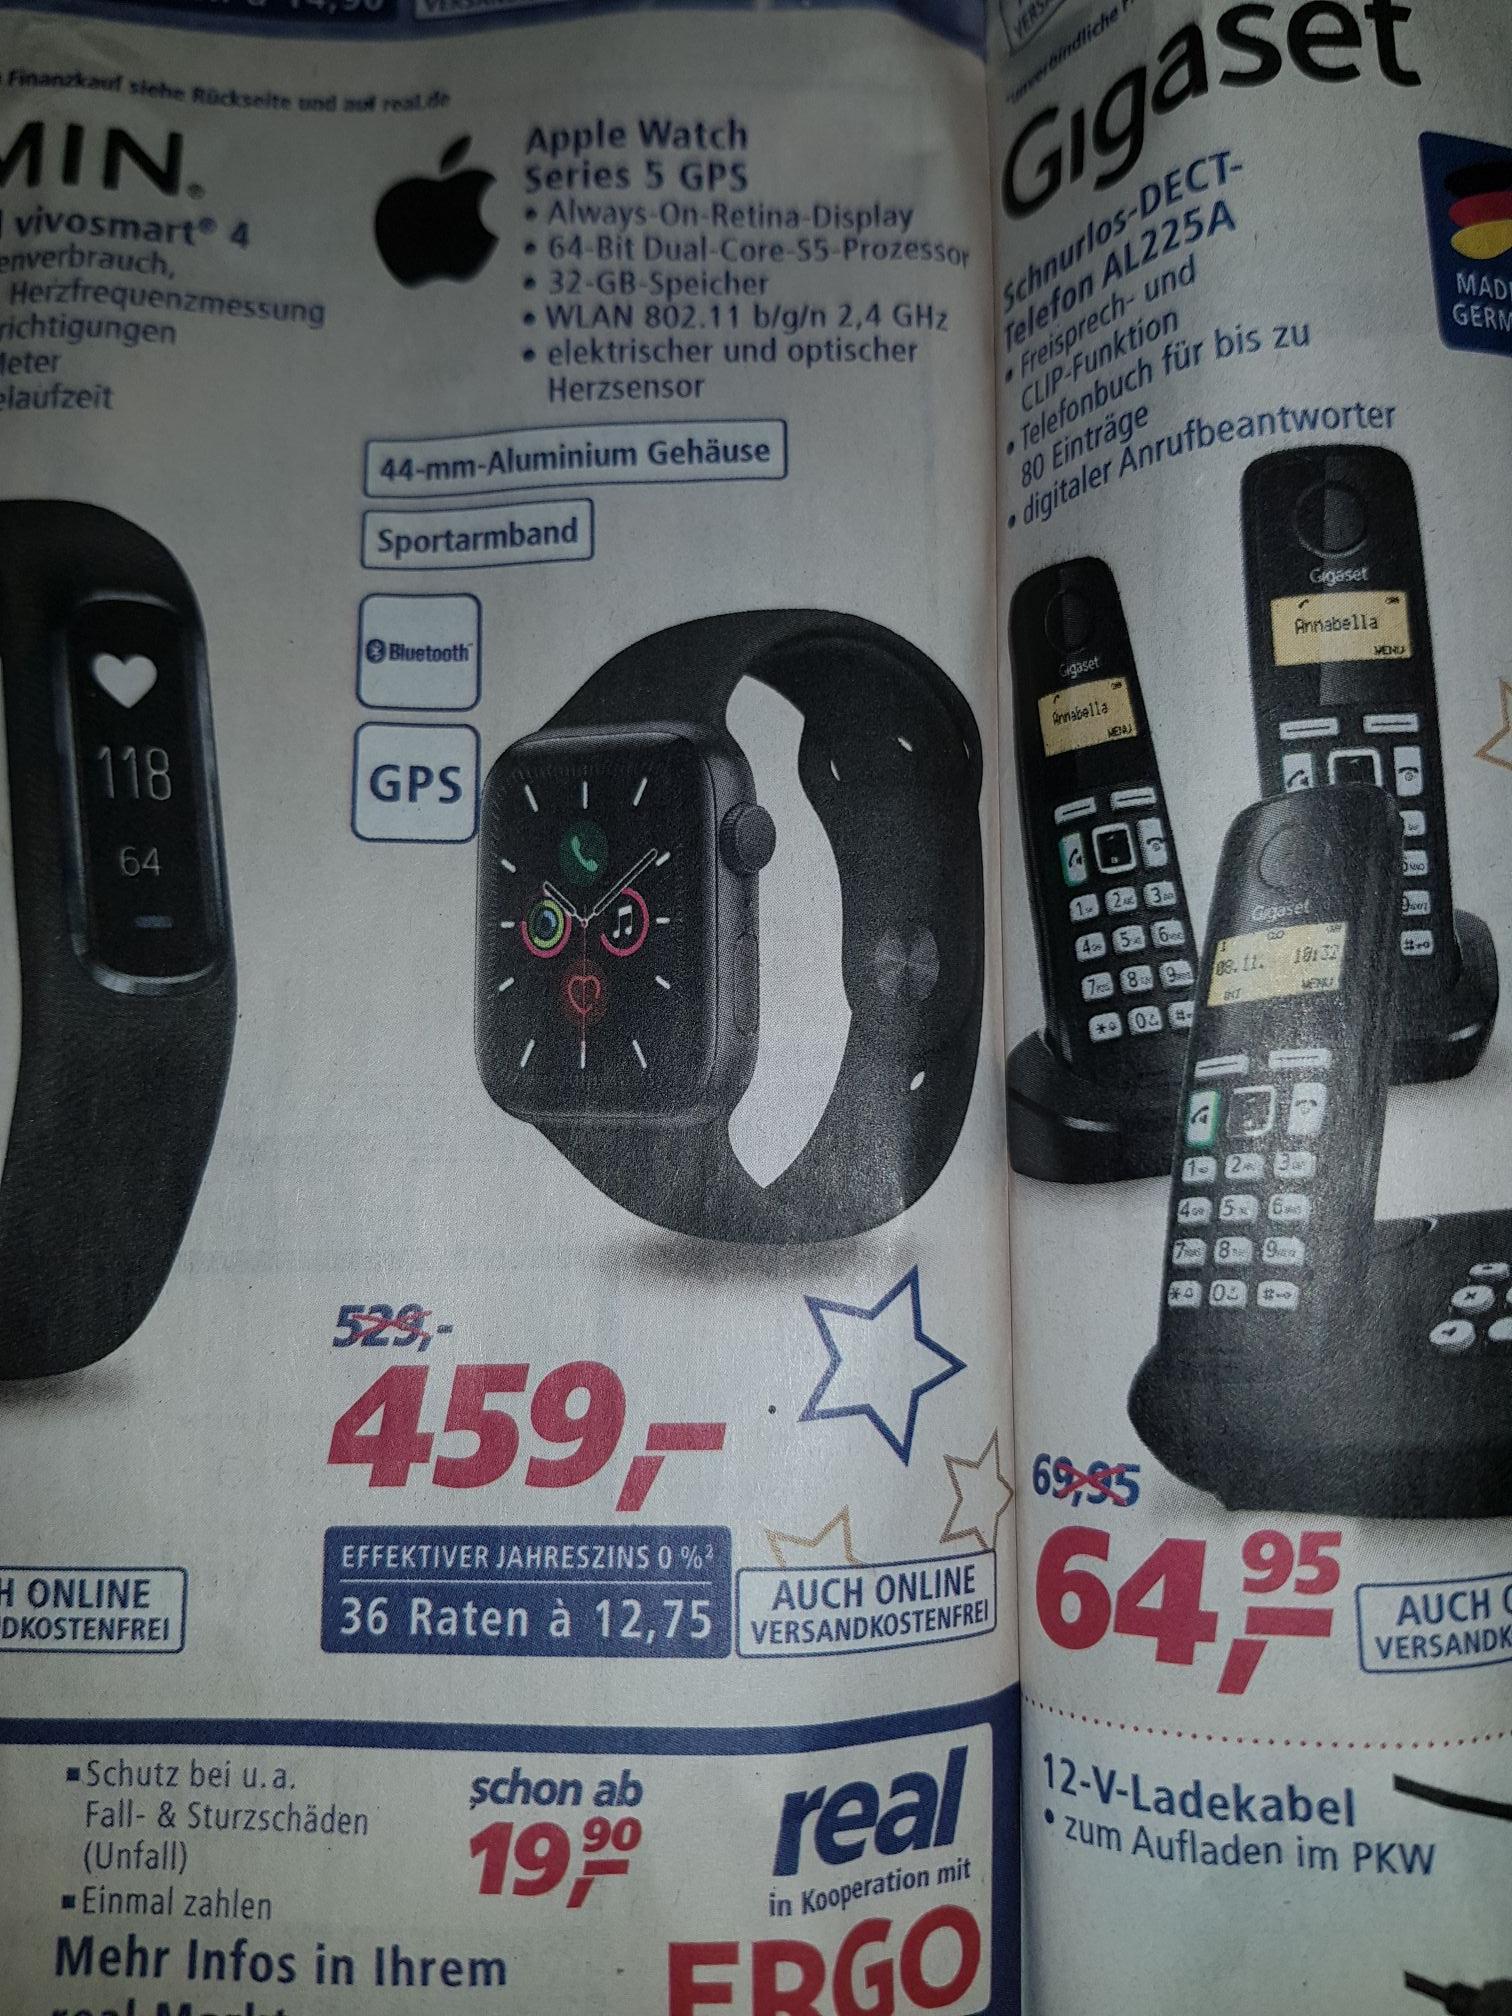 Apple Watch Series 5 GPS Real (F&F)